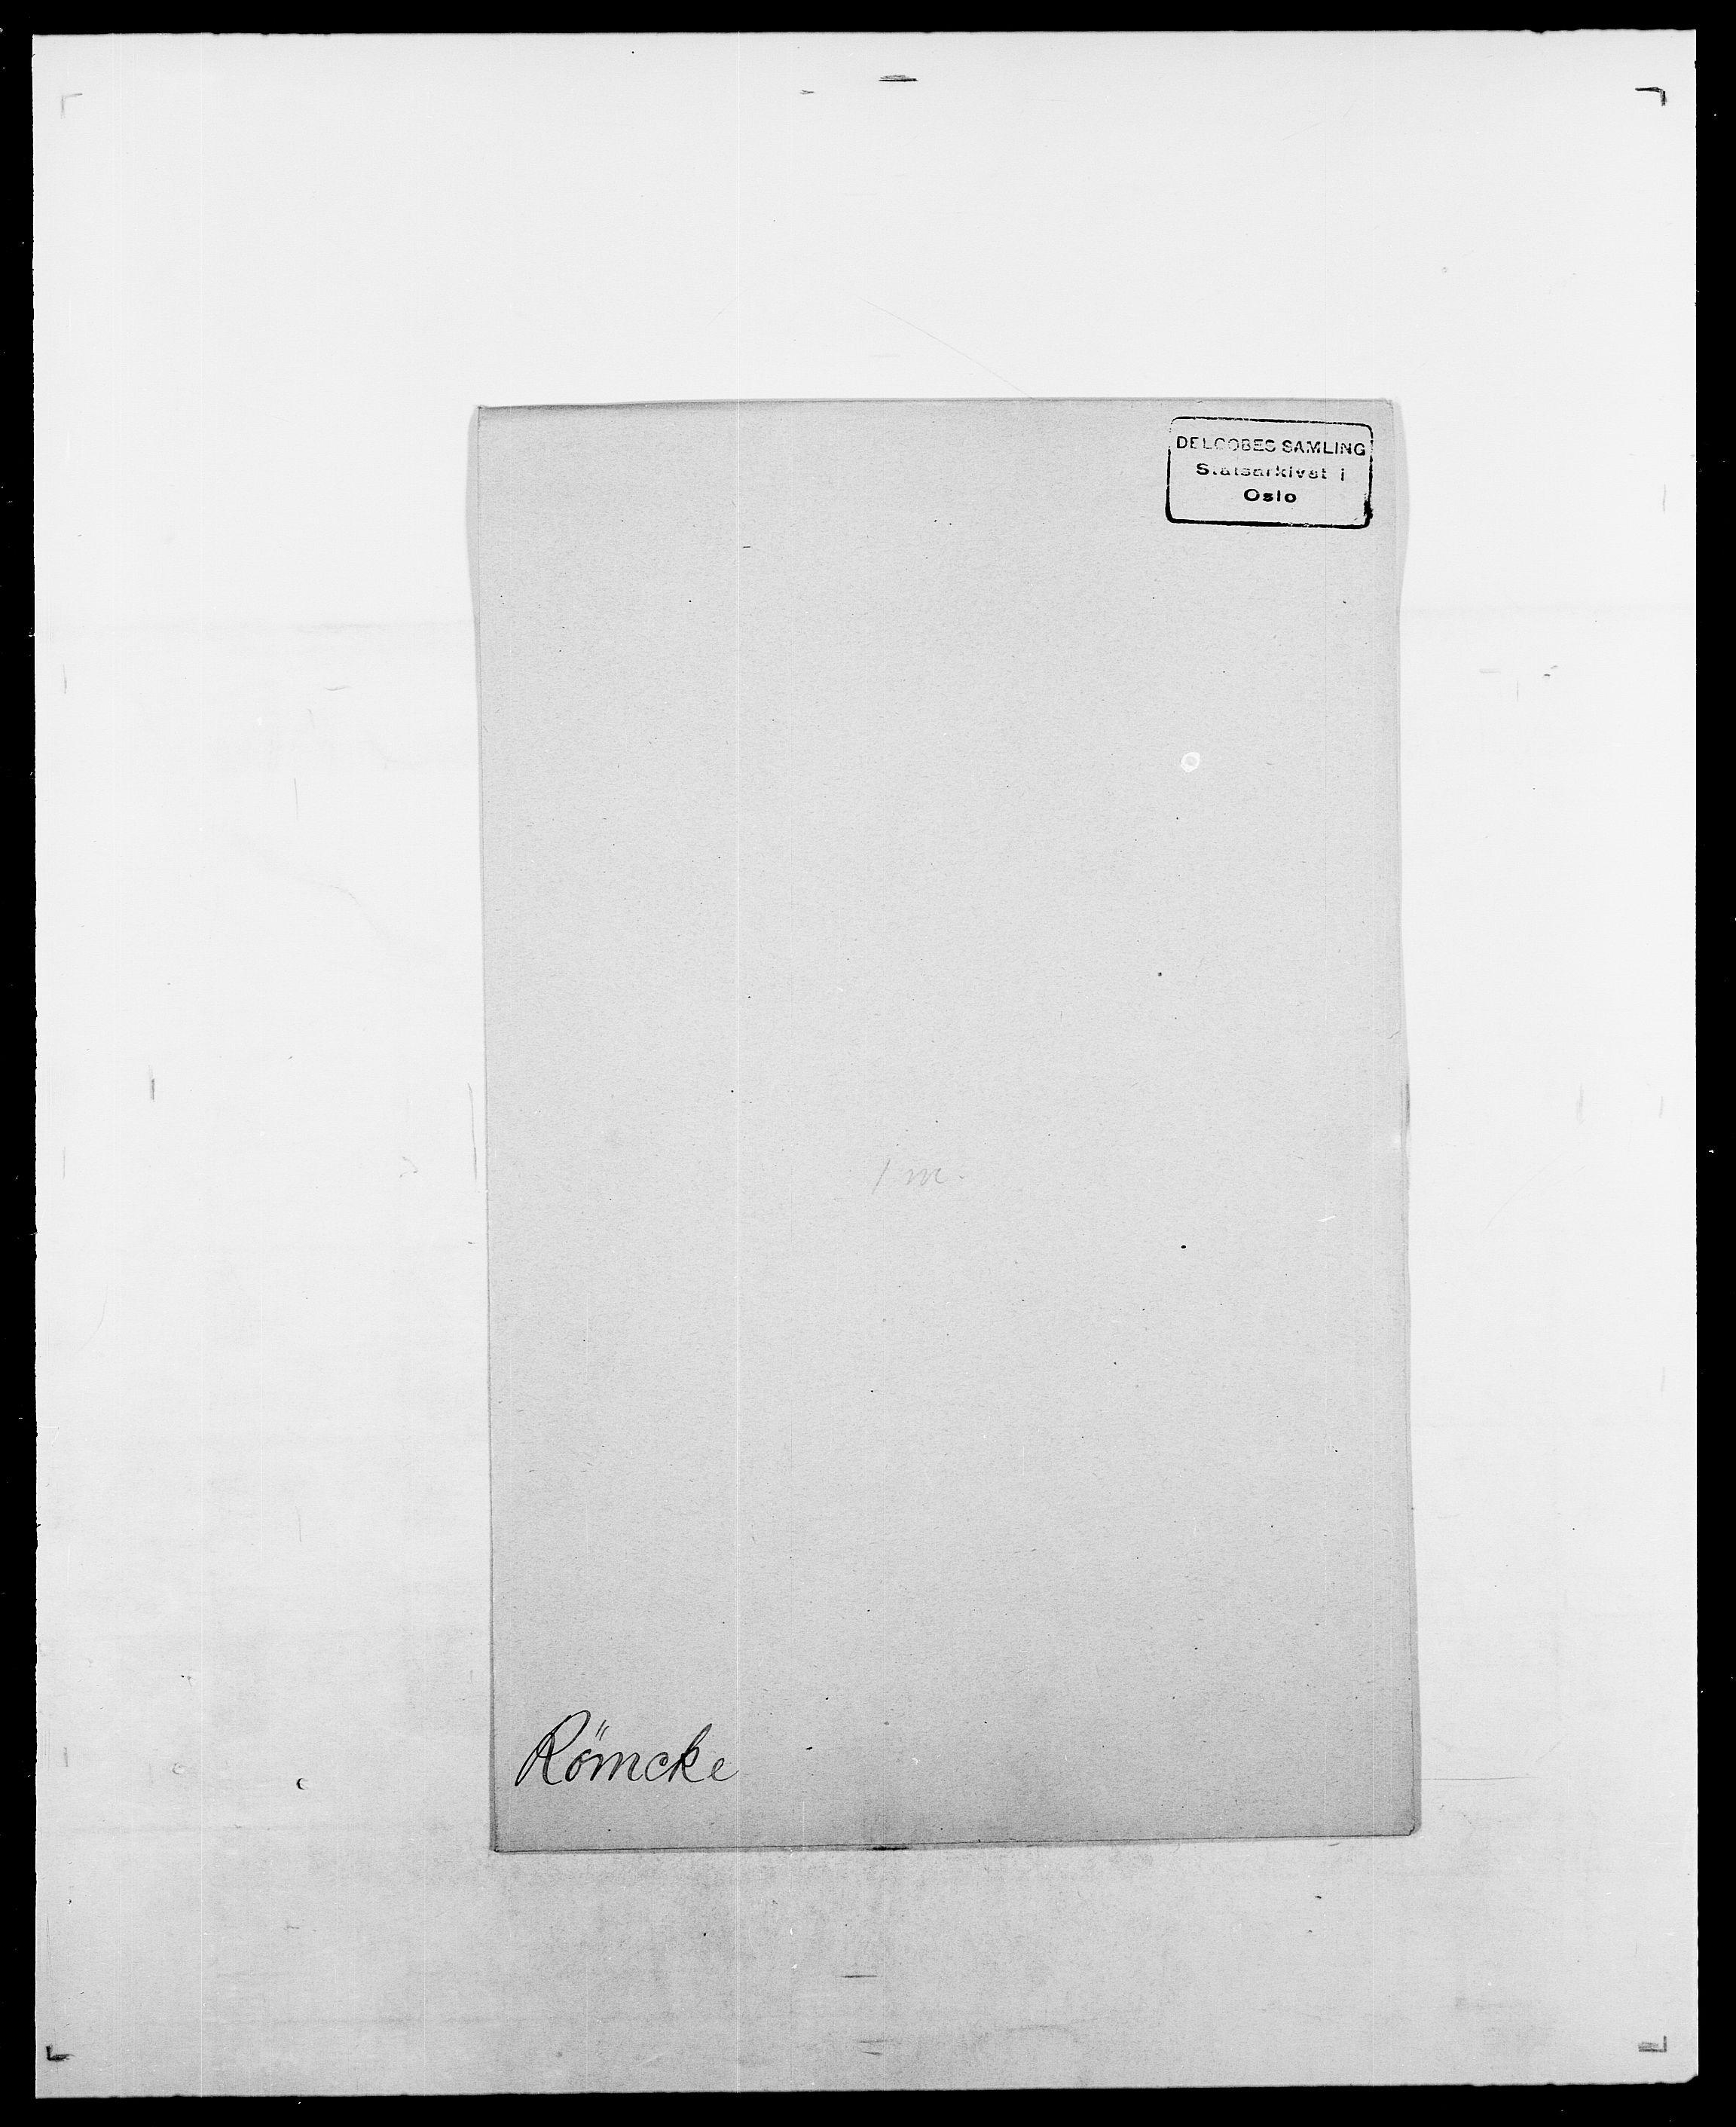 SAO, Delgobe, Charles Antoine - samling, D/Da/L0033: Roald - Røyem, s. 713